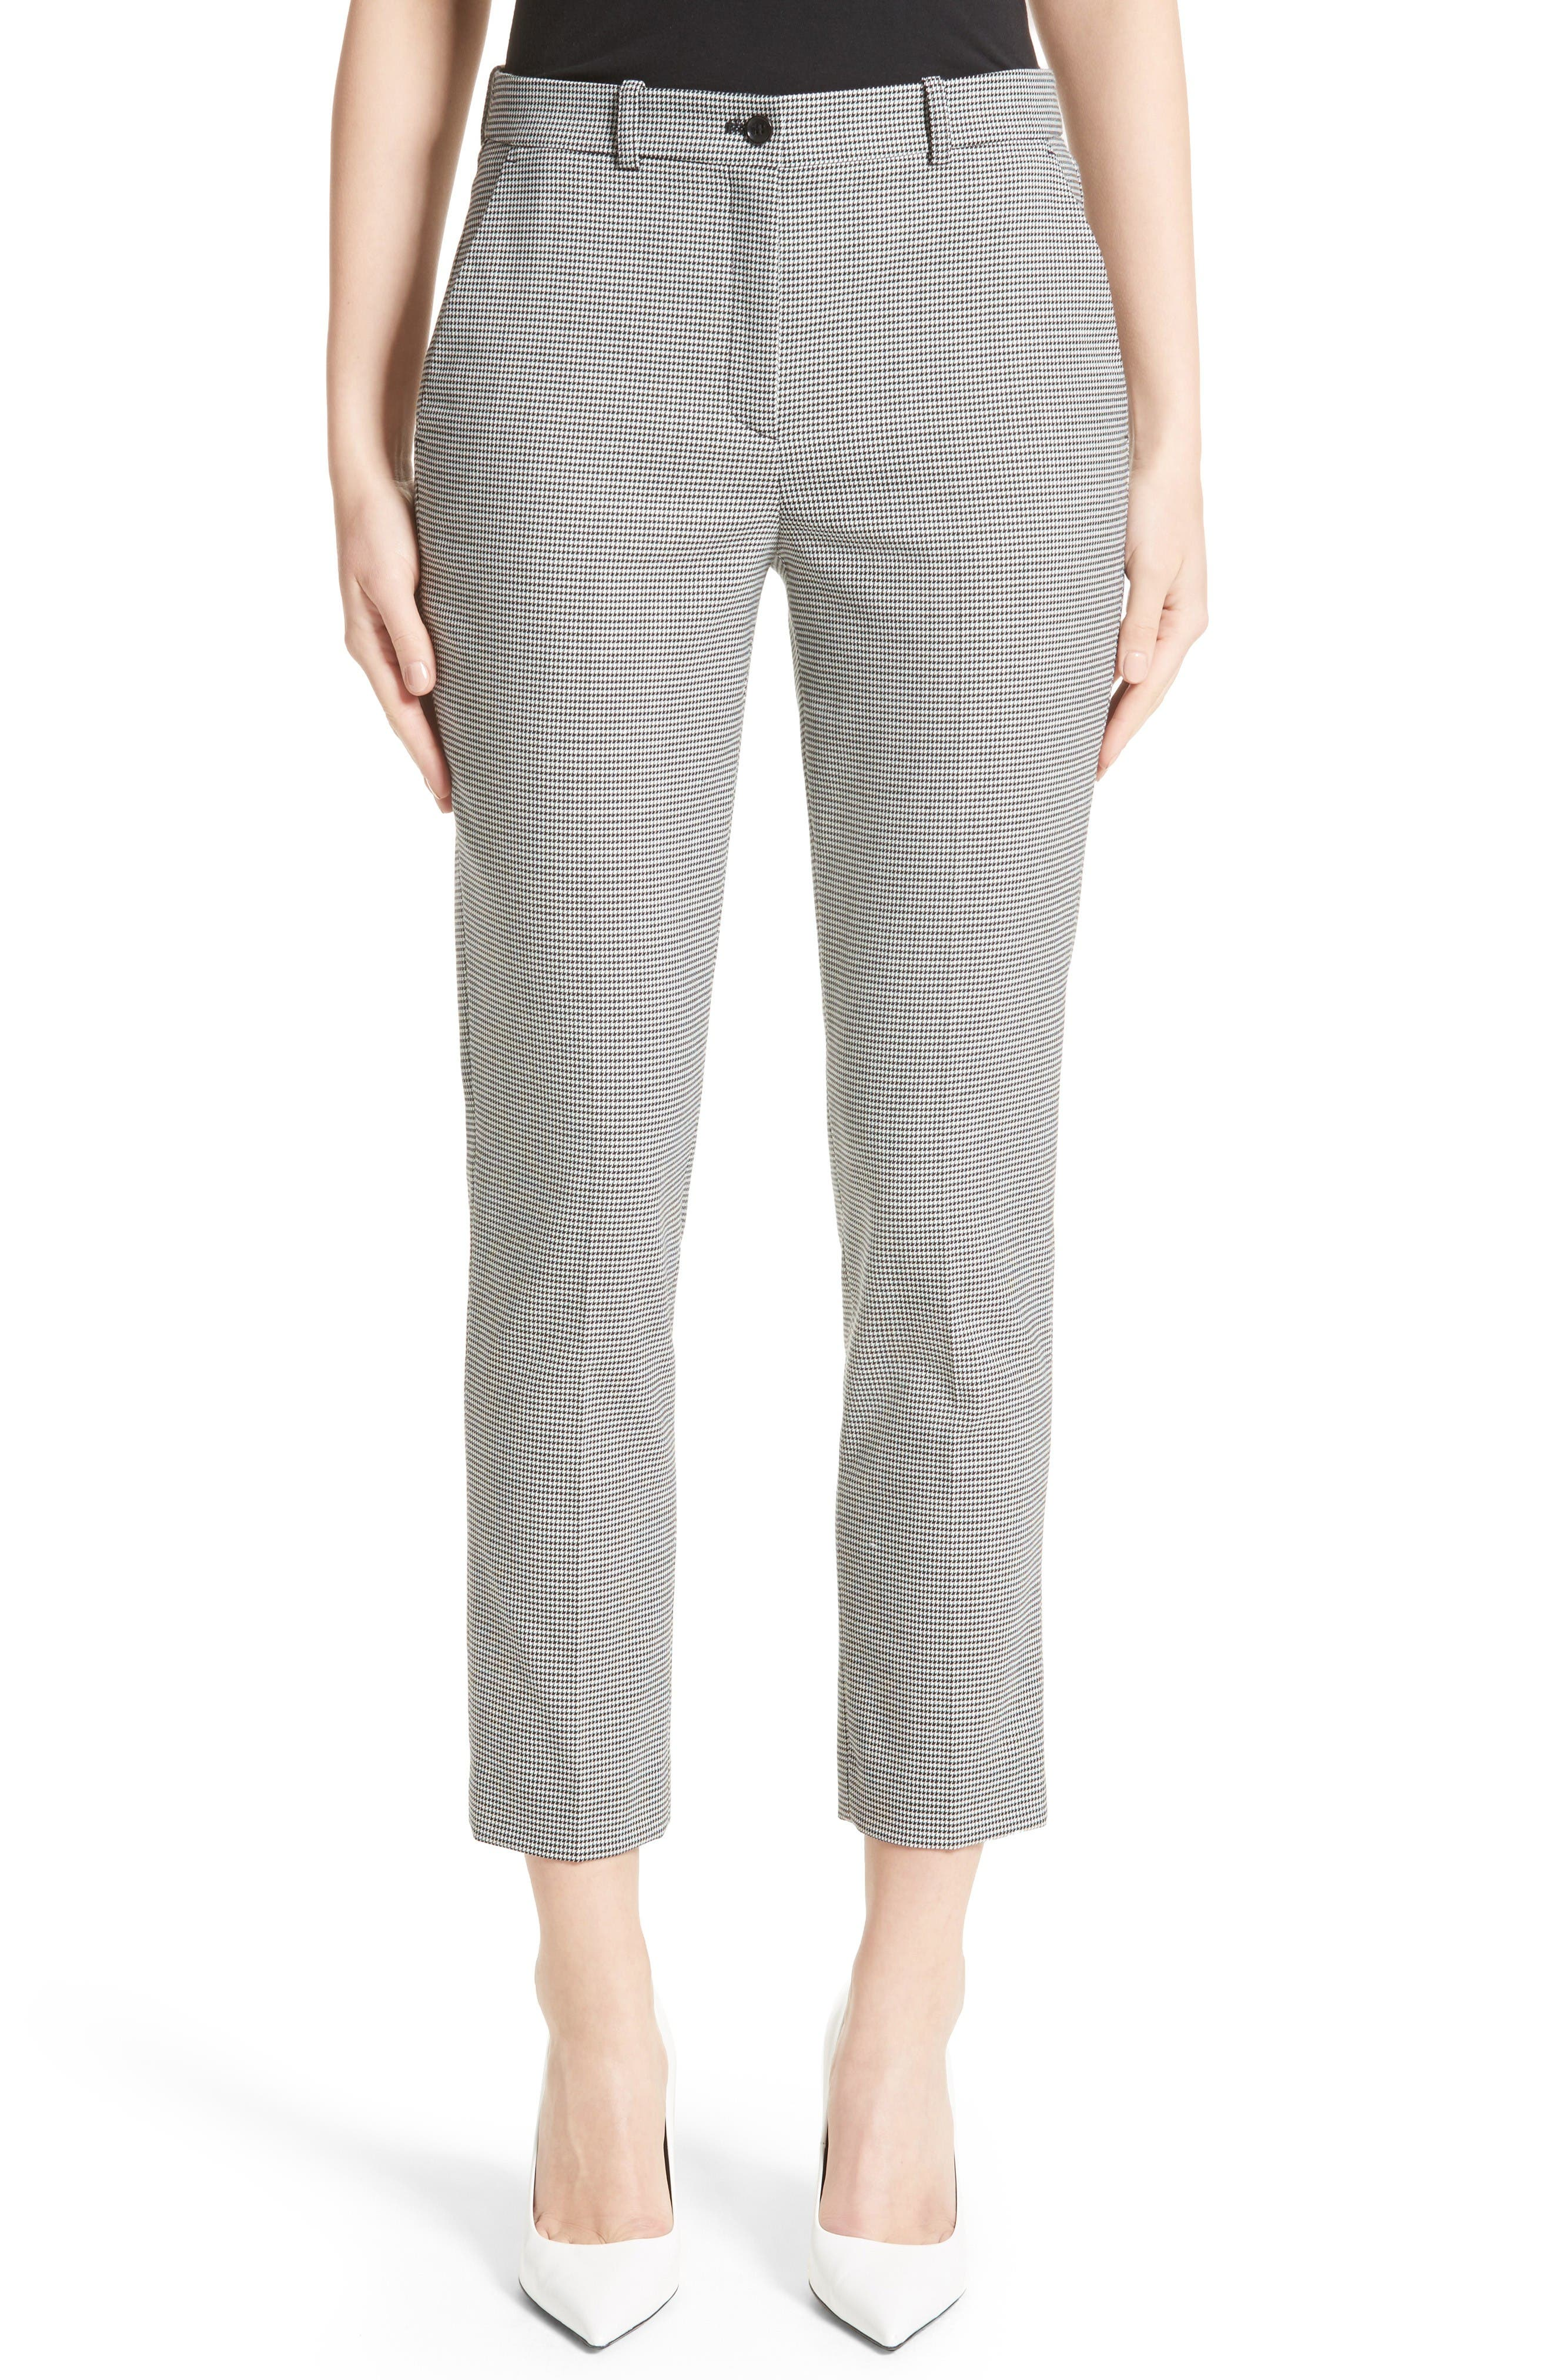 Michael Kors Samantha Houndstooth Pants